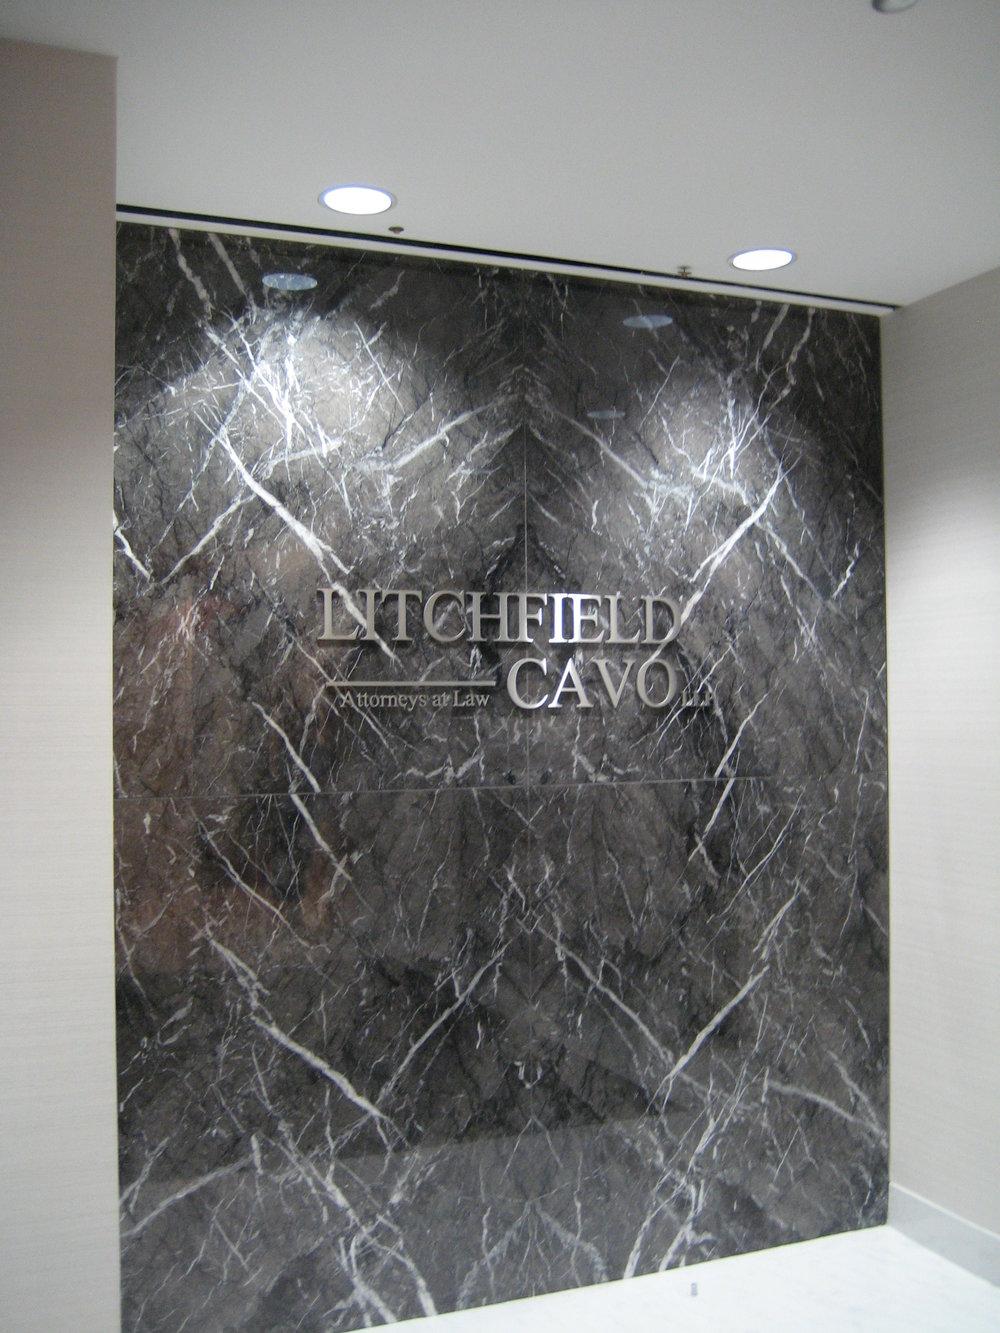 Litchfield Cavo 01.04 - Entry Signage.jpg